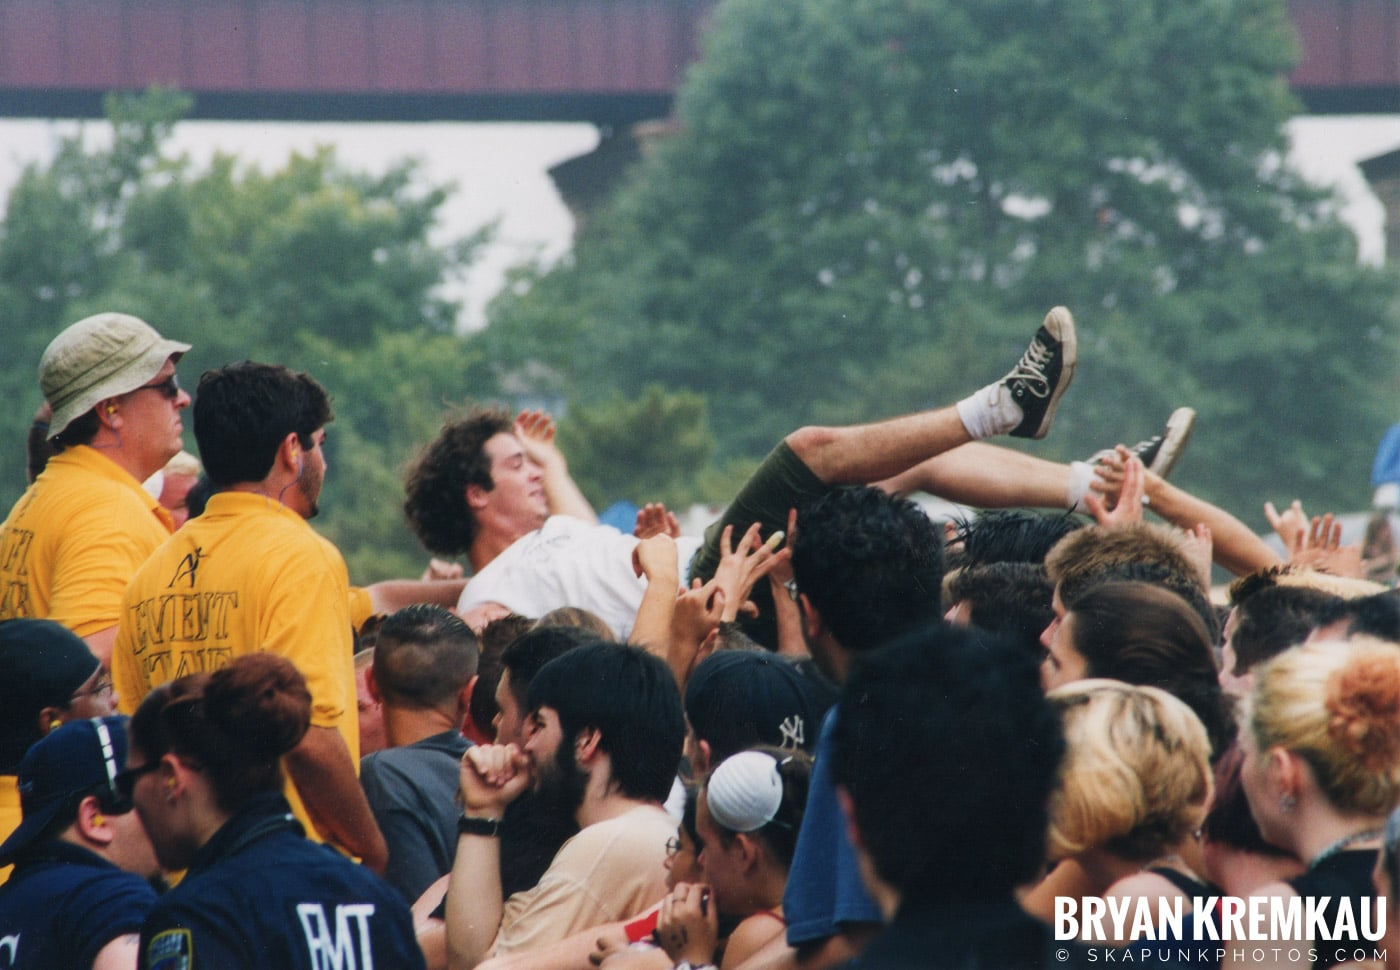 Crowd Shots @ Vans Warped Tour, Randall's Island, NYC - 8.4.01 (7)